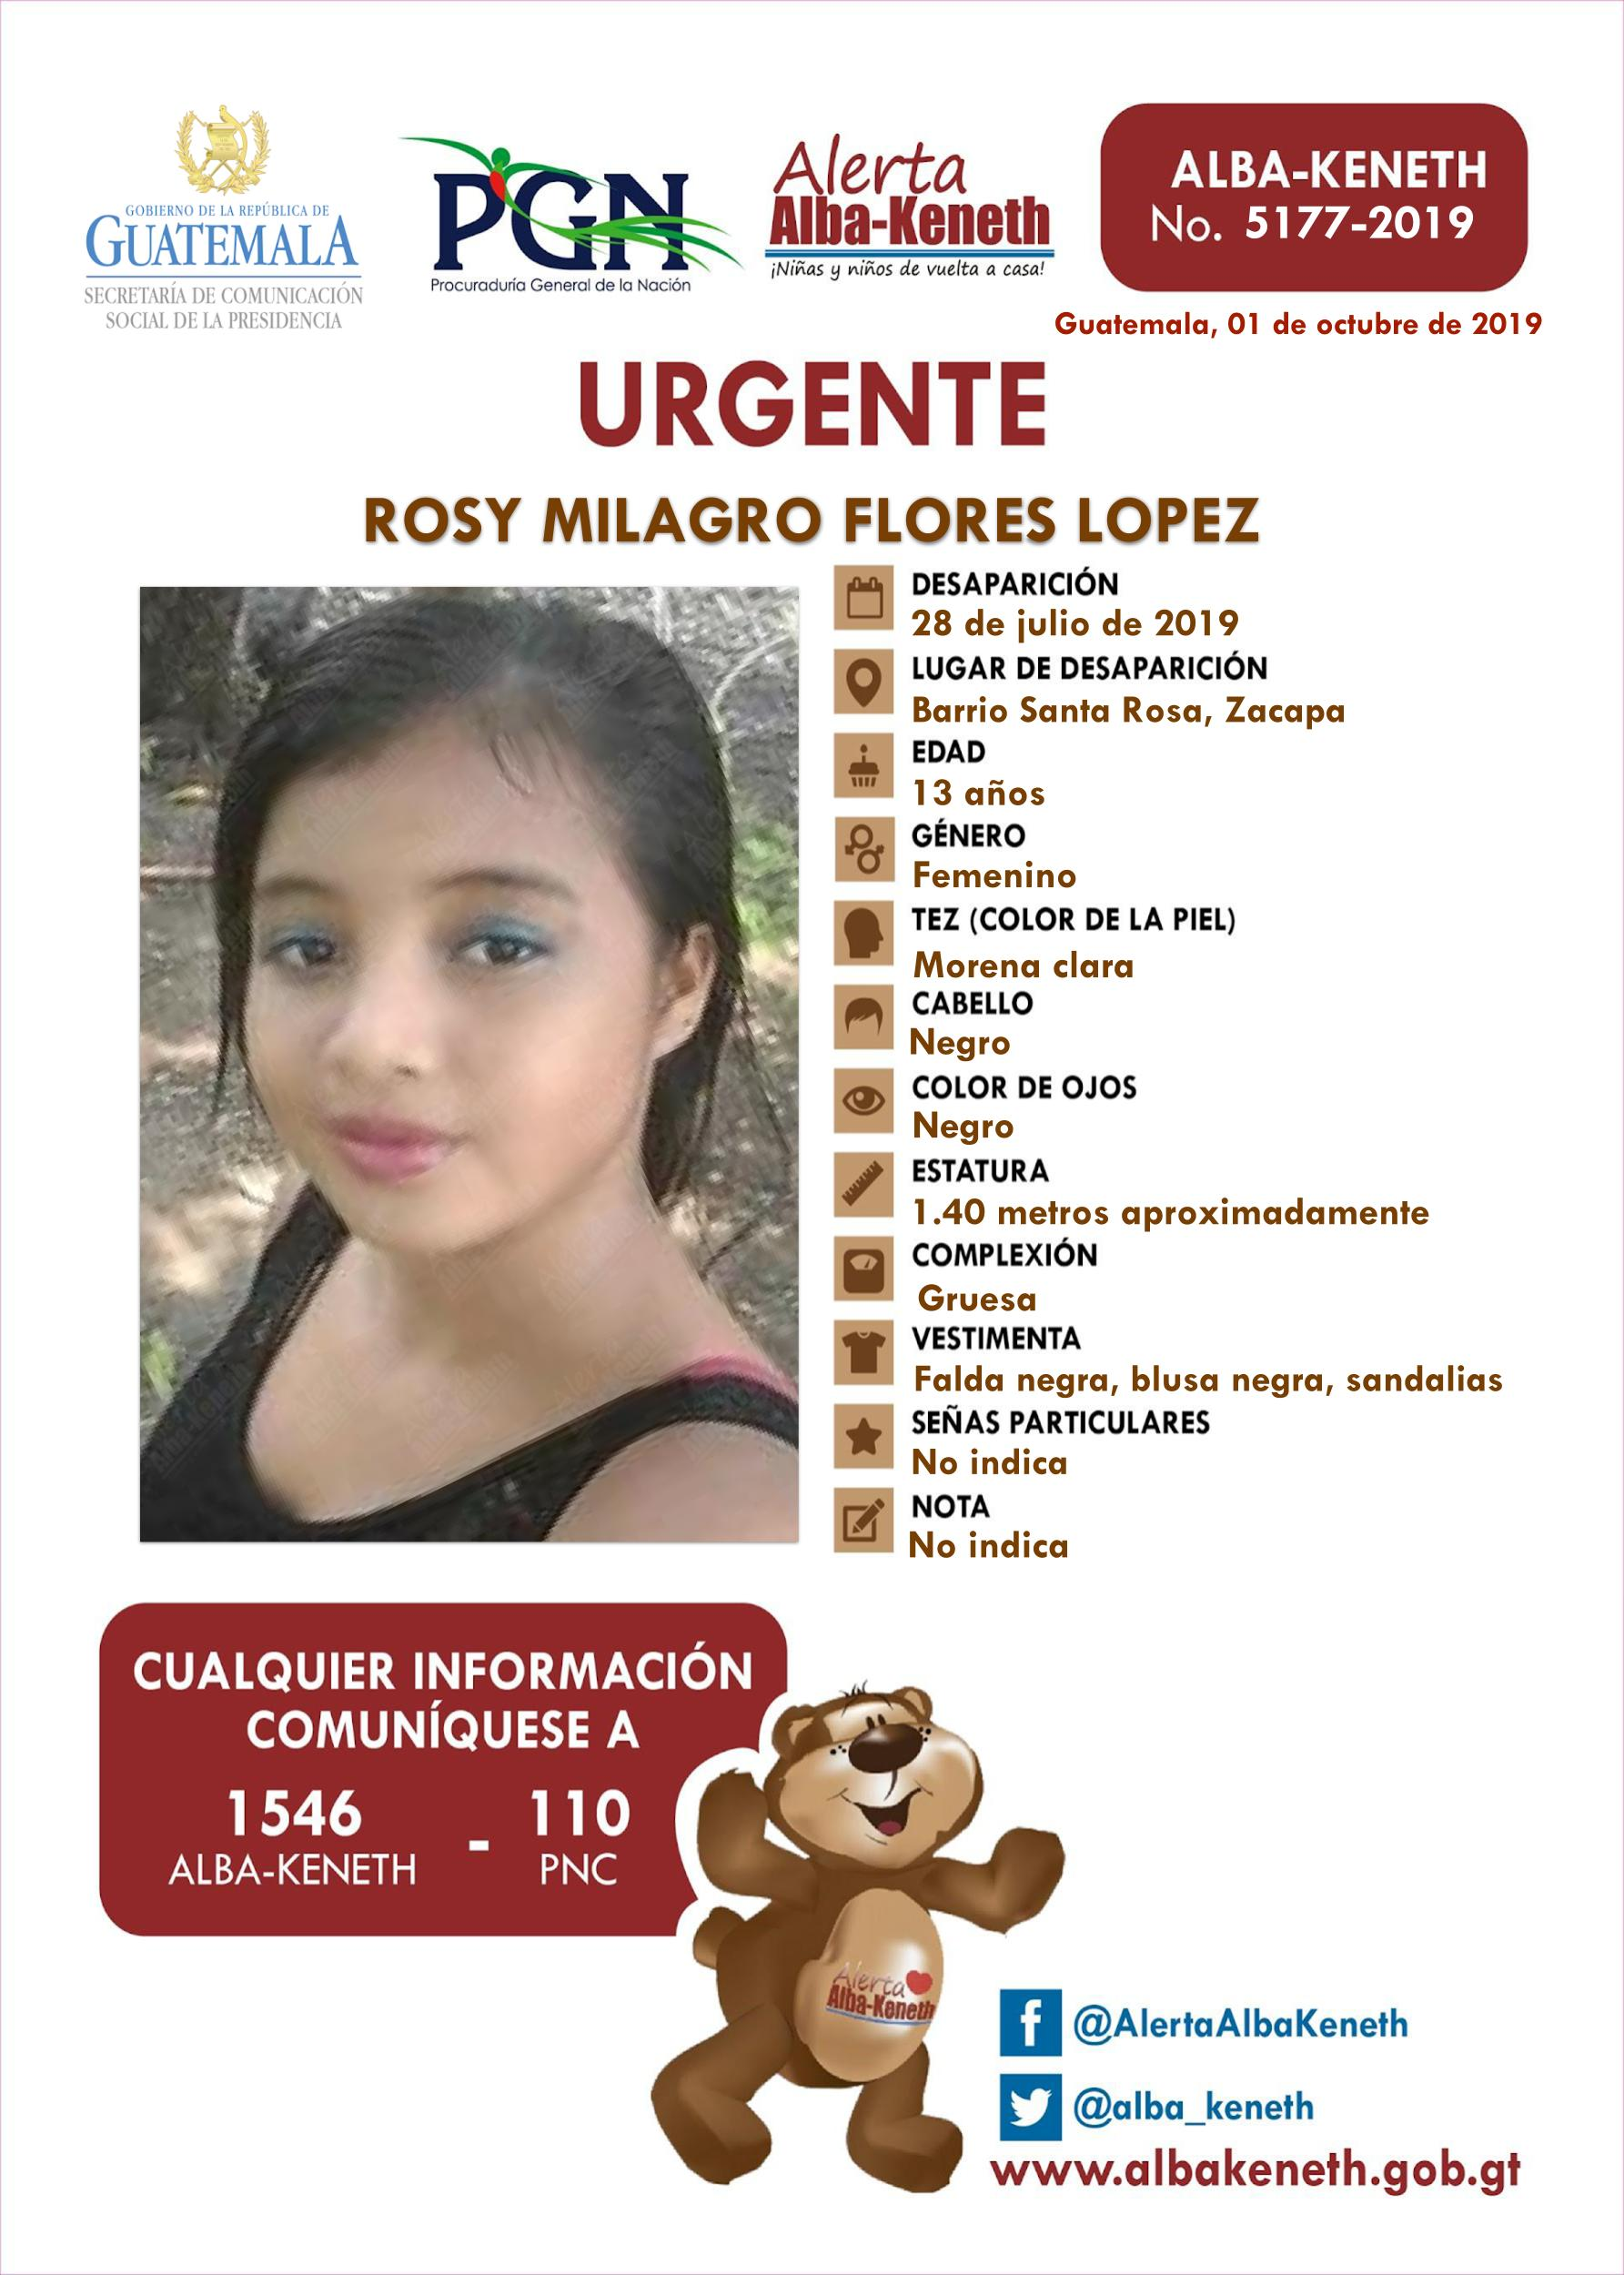 Rosy Milagro Flores Lopez